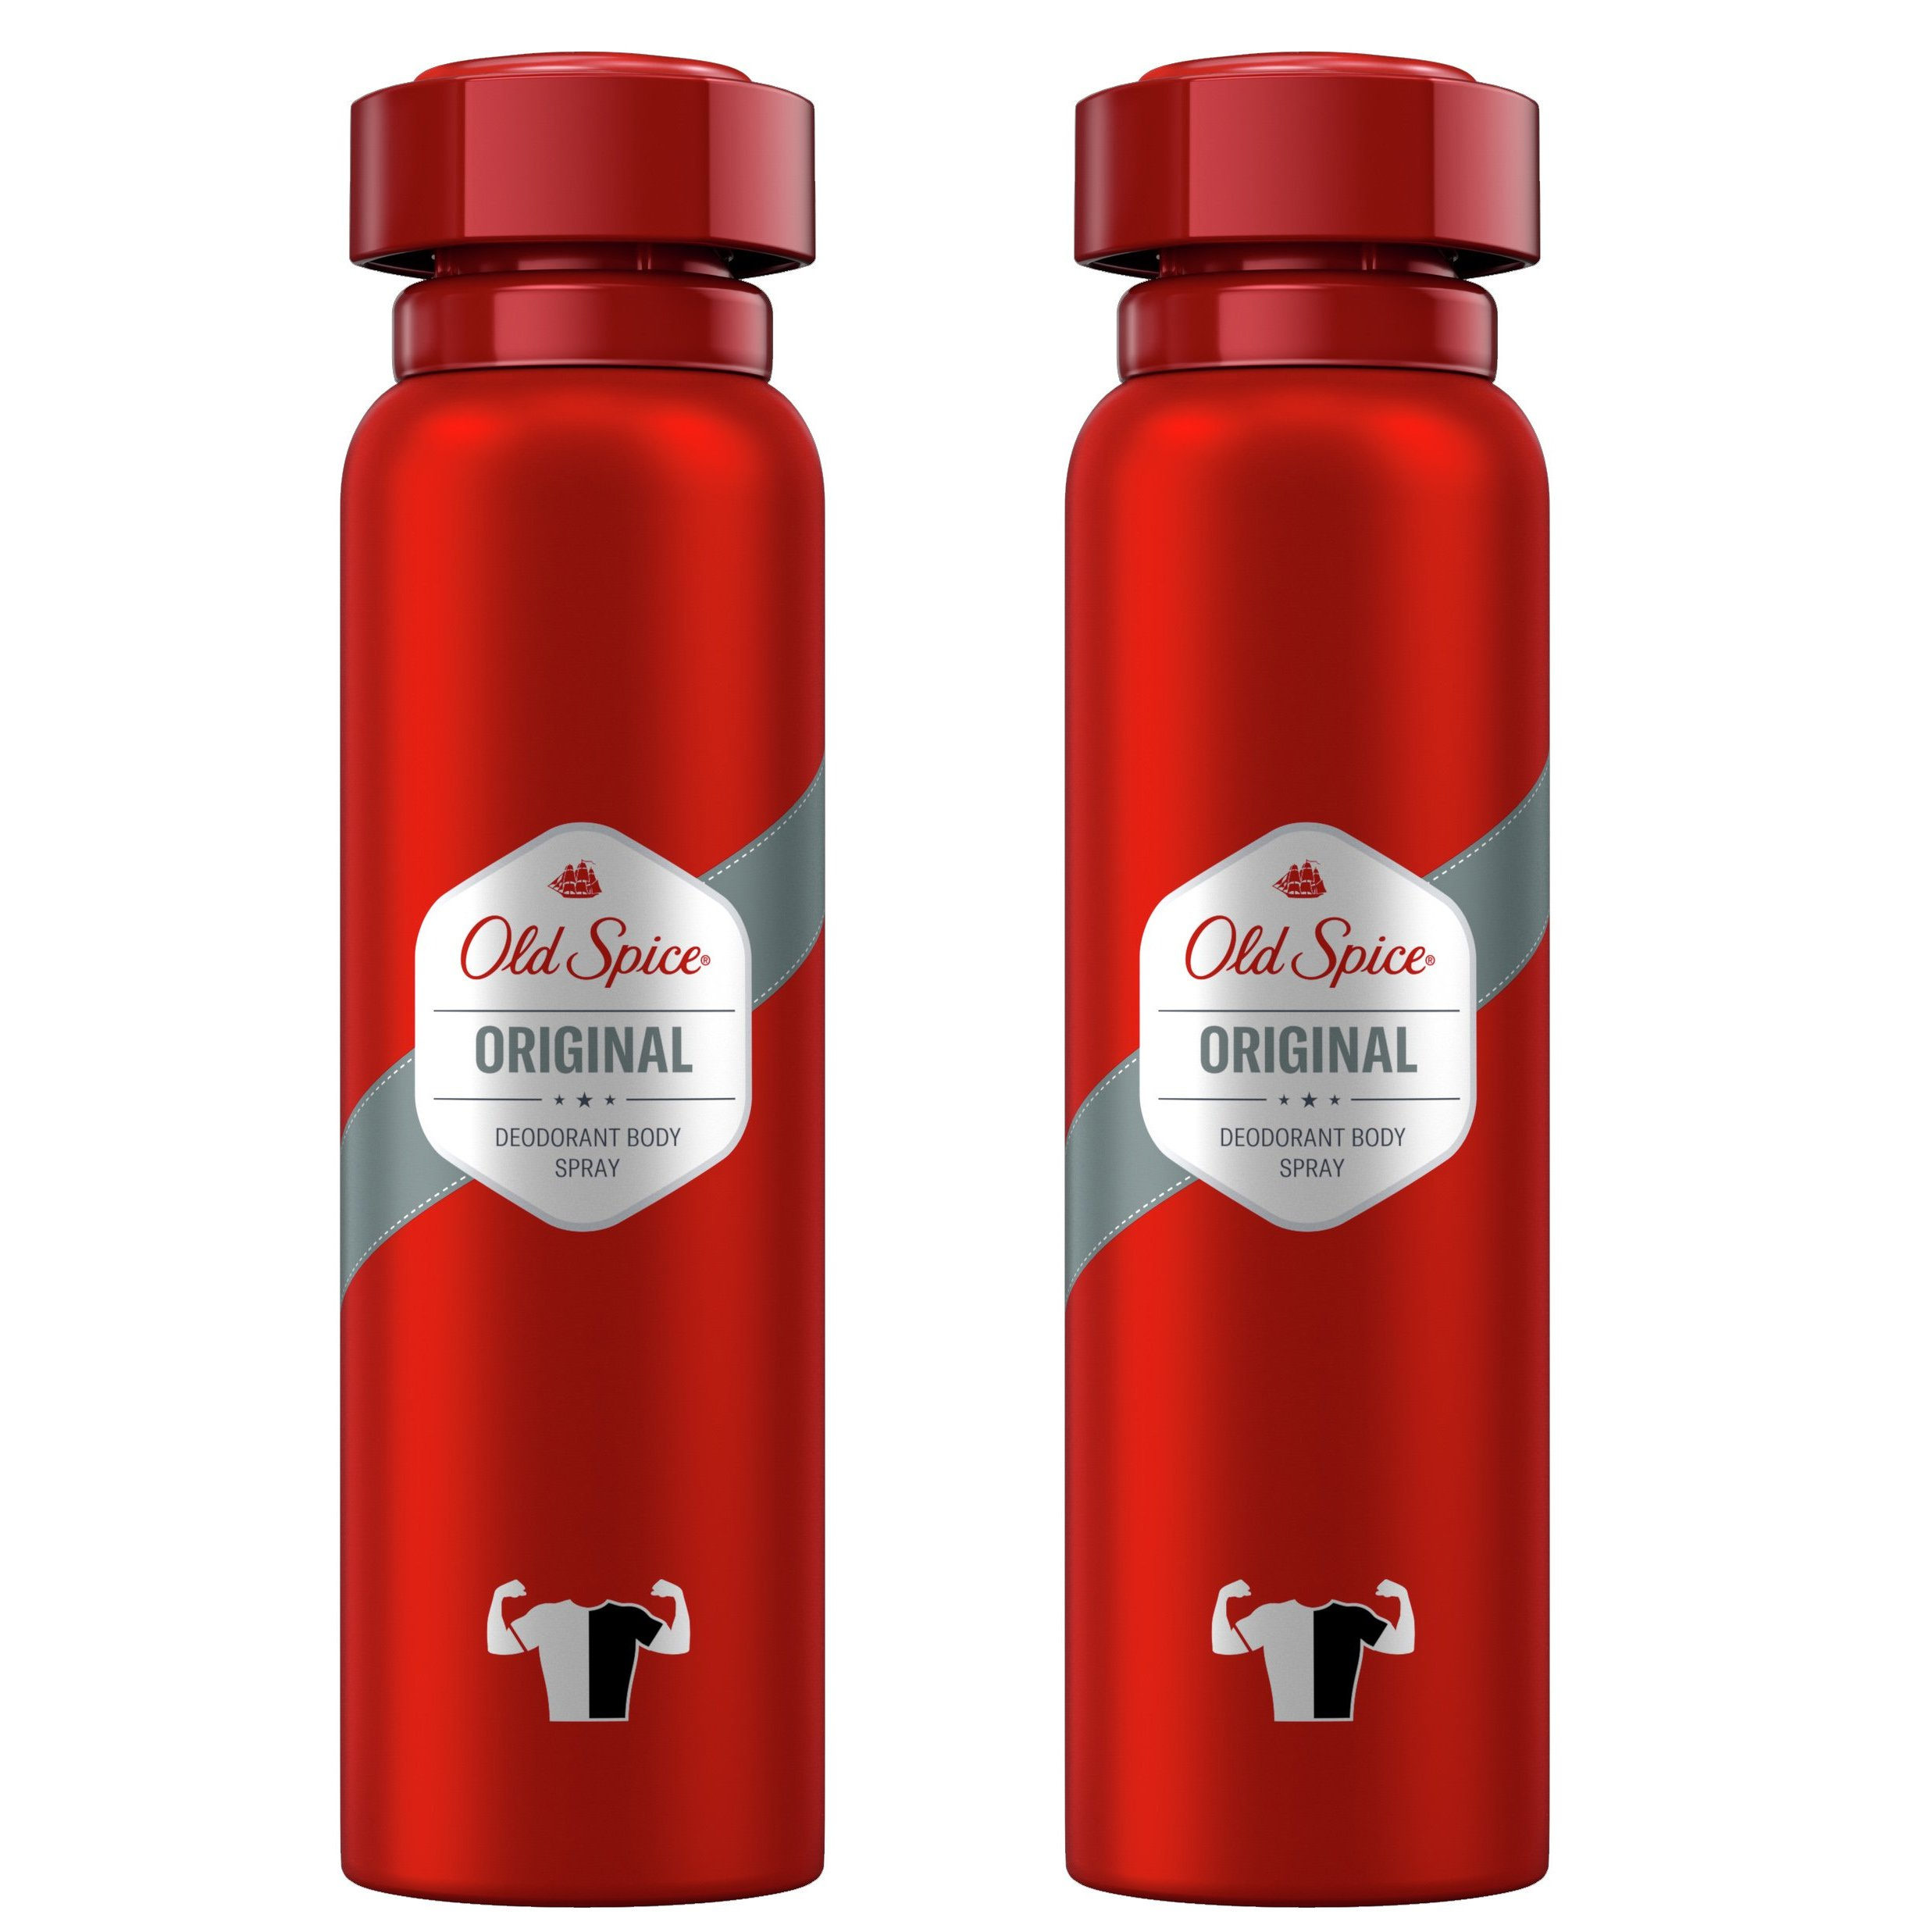 Old Spice Πακέτο Προσφοράς Original Deodorant Body Spray for Men Αποσμητικό με Αυθεντικό Άρωμα για Άνδρες 2x150ml